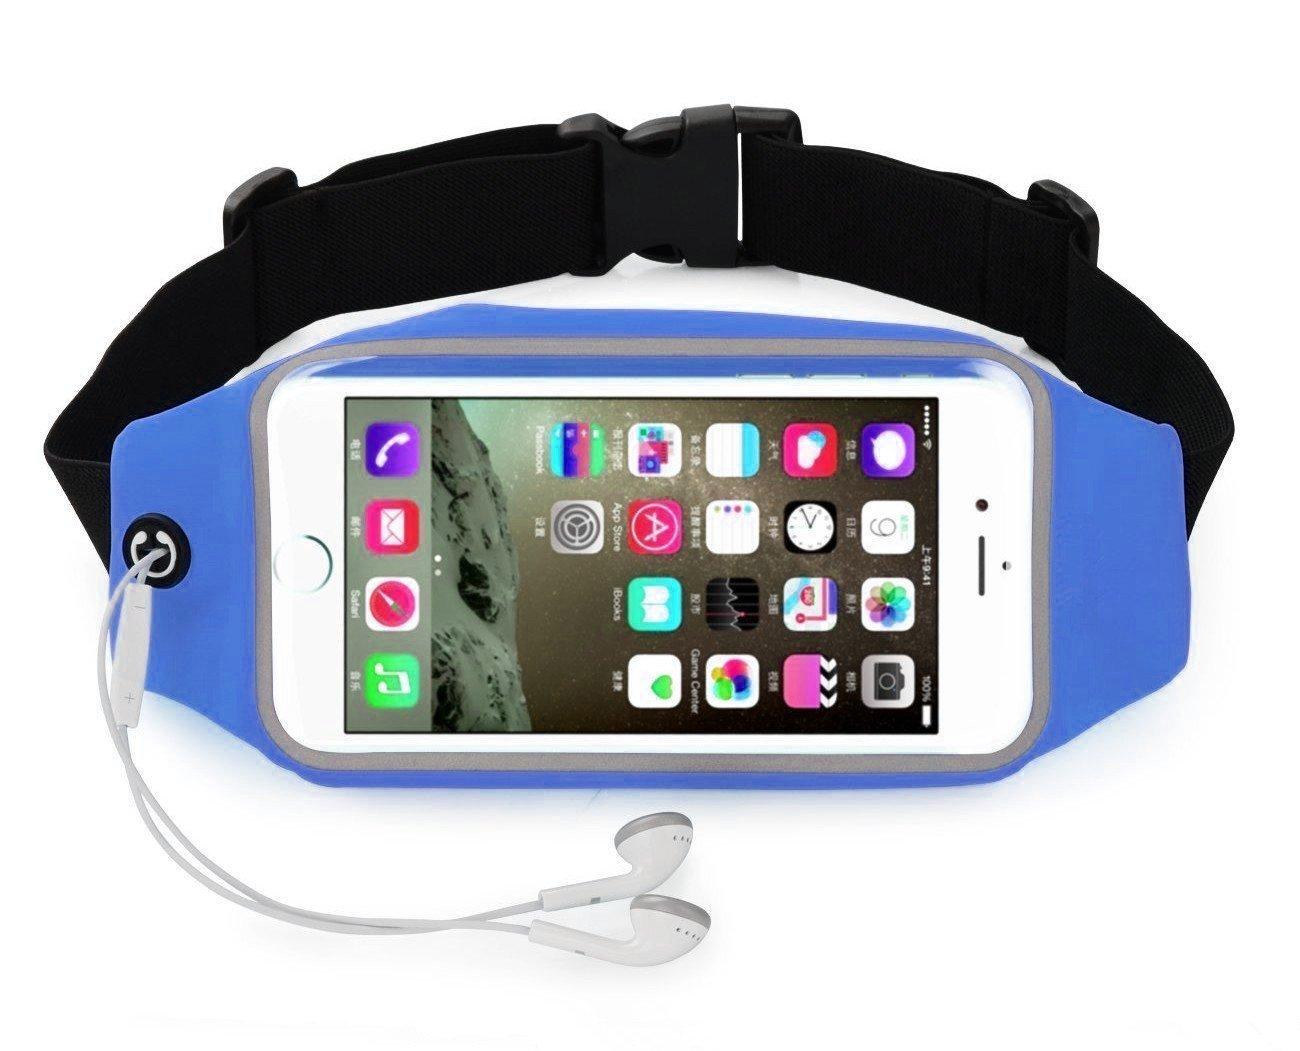 Bareas YD03 手机腰包 5.5英寸 户外运动包 手机跑步包 内置钥匙扣 轻便防汗,手机户外配件。